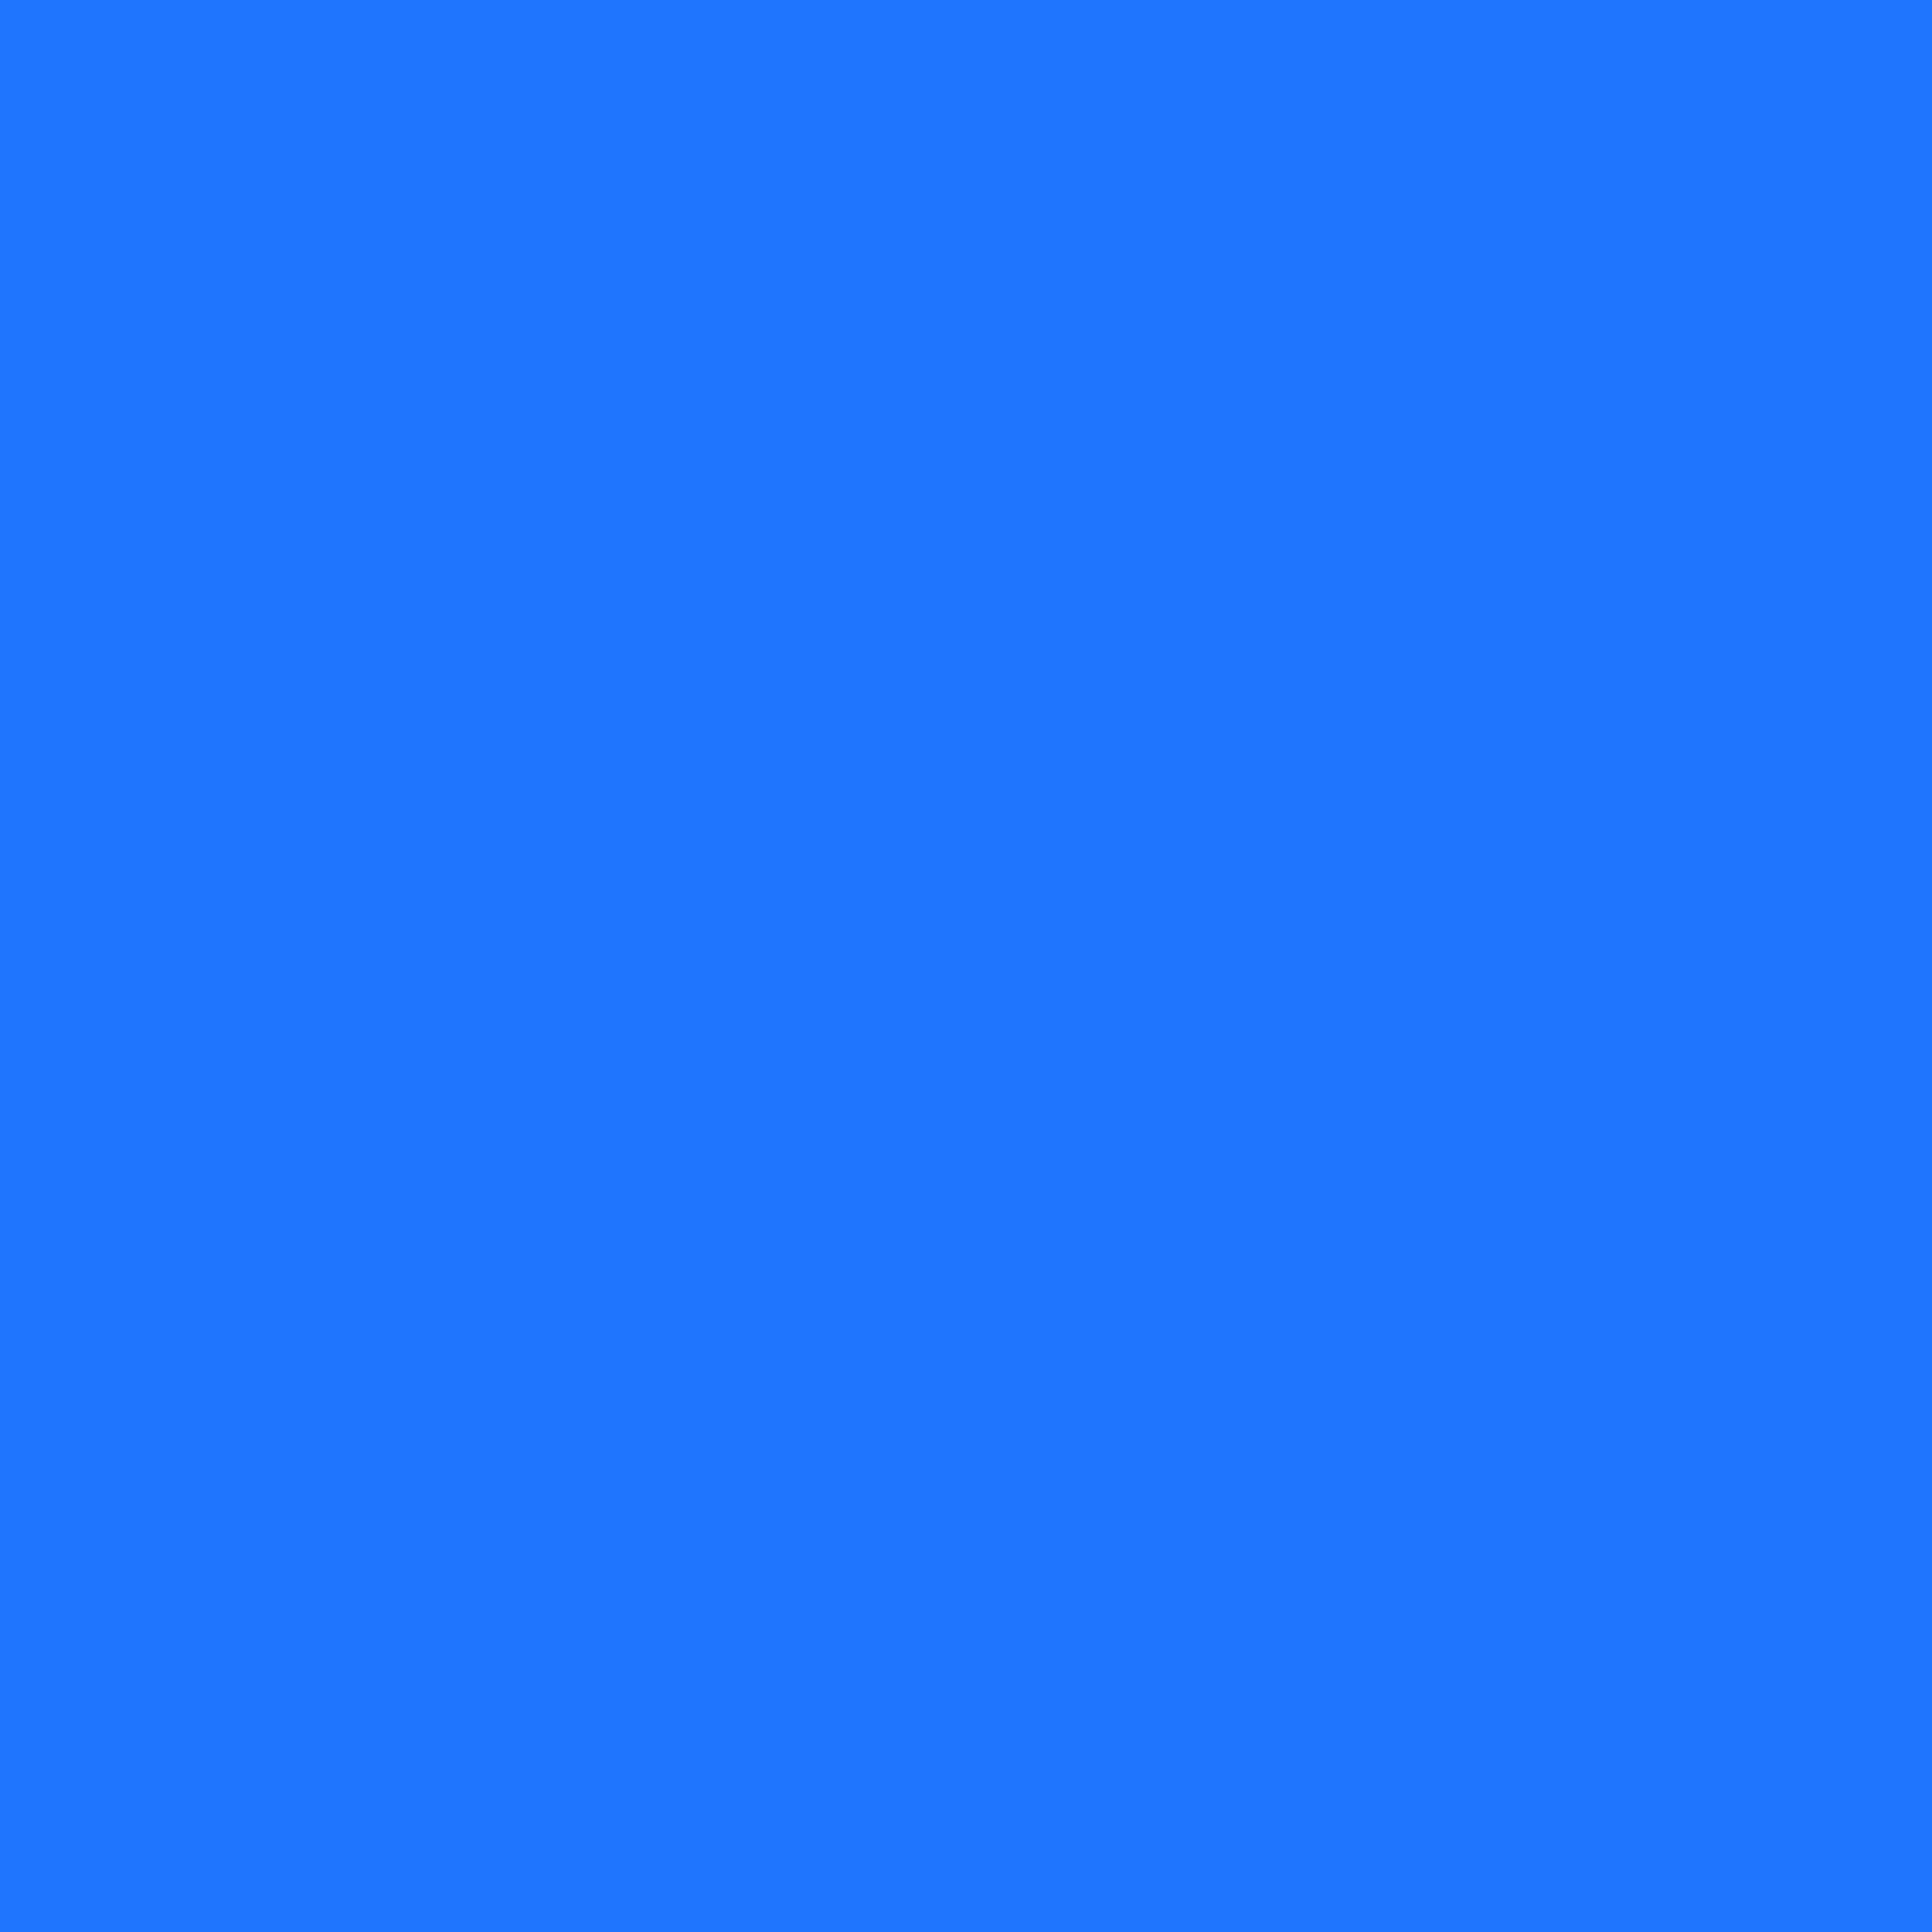 3600x3600 Blue Crayola Solid Color Background